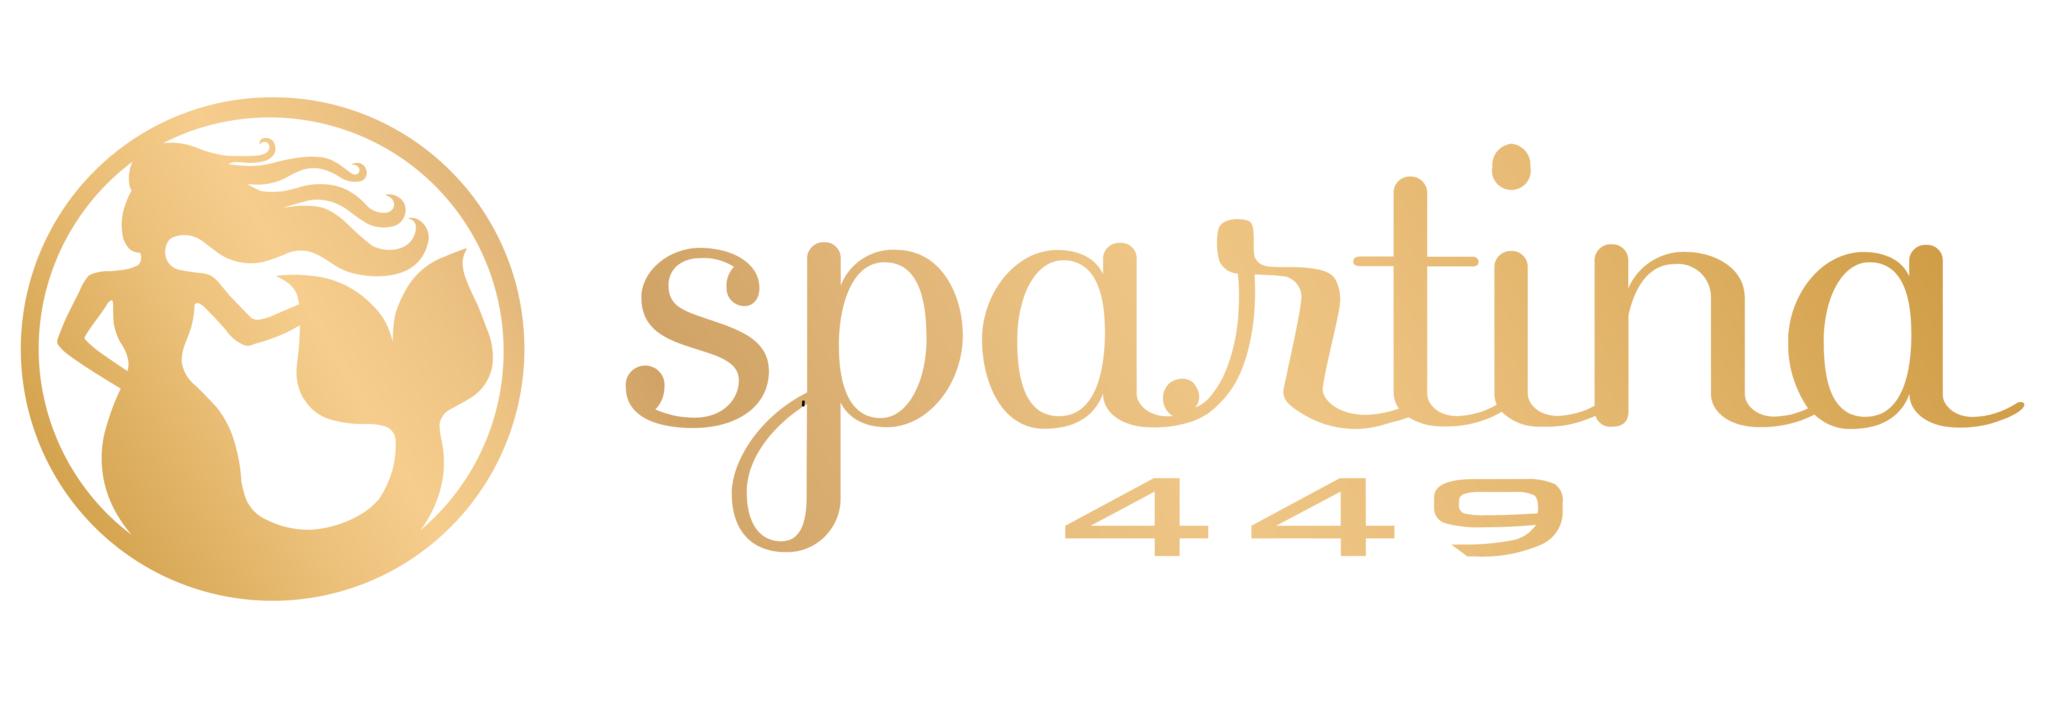 Featuring Spartina